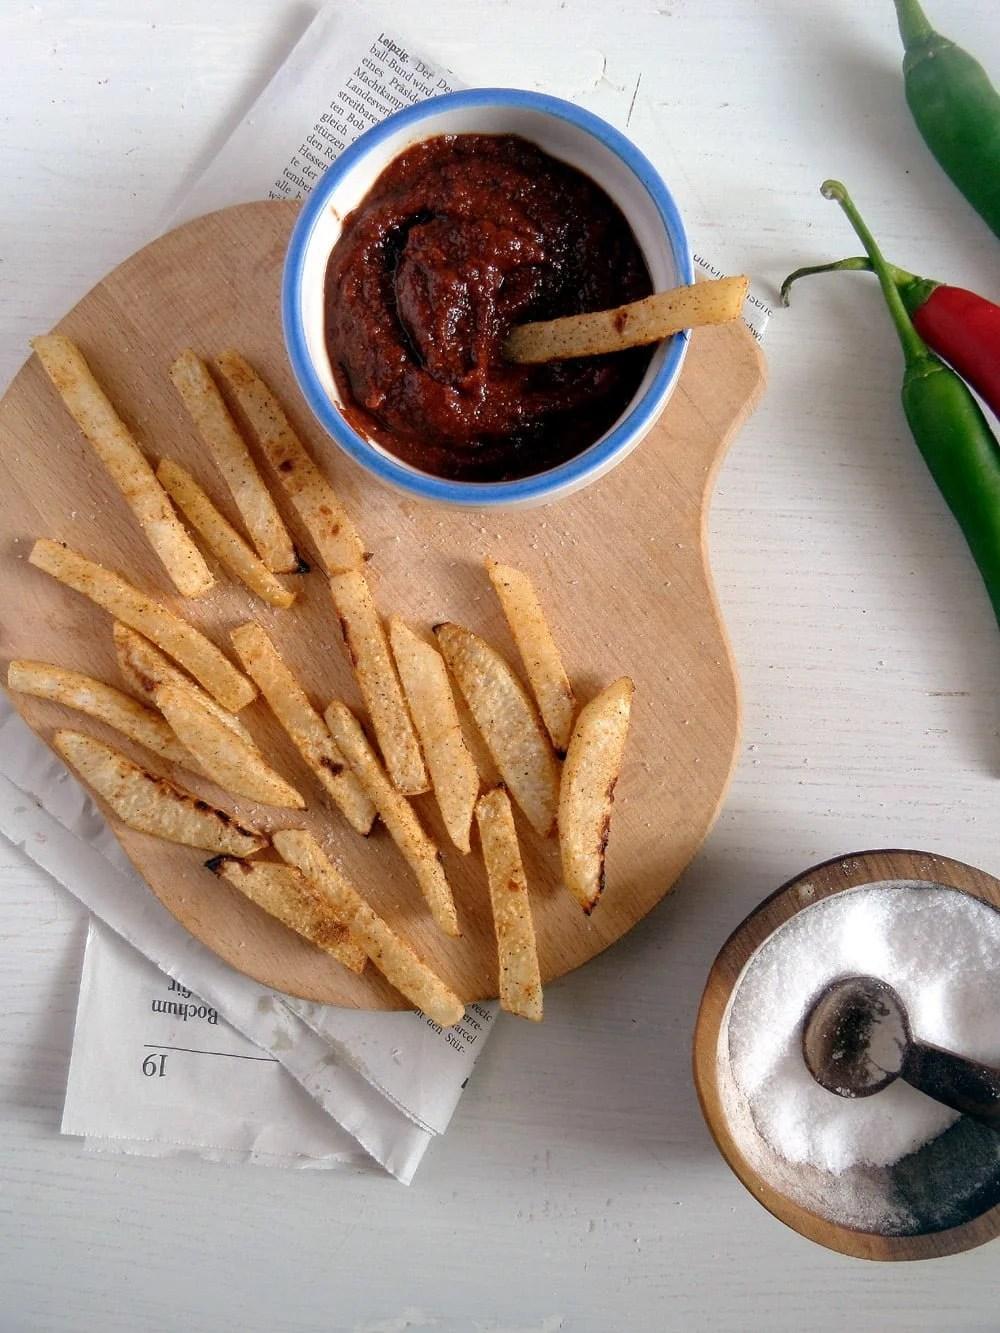 kohlrabi fries ketchup Kohlrabi Fries with Curry Ketchup